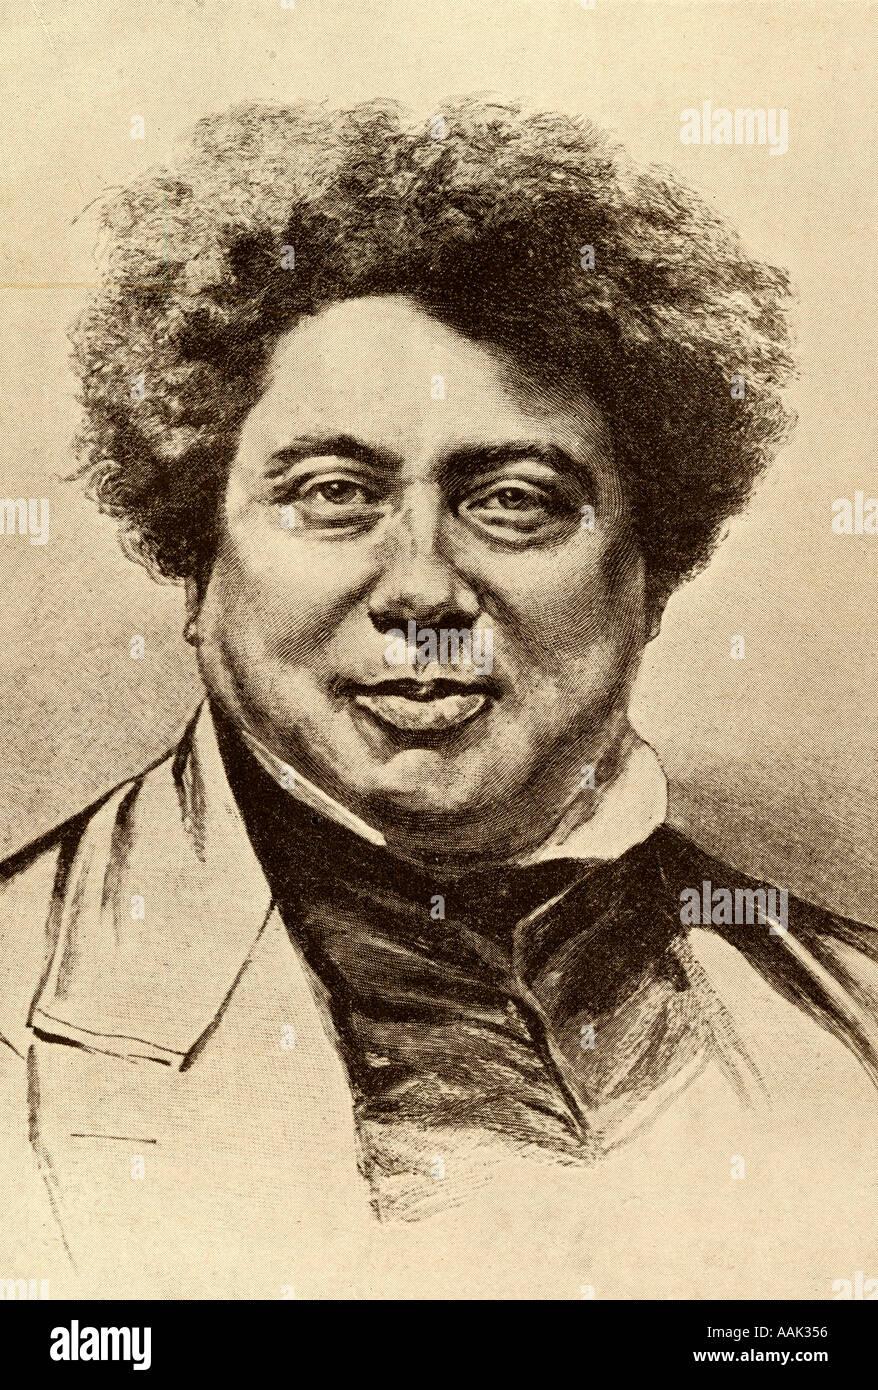 Alexandre Dumas Senior, aka Alexandre Dumas père, 1802 - 1870.  French author. - Stock Image